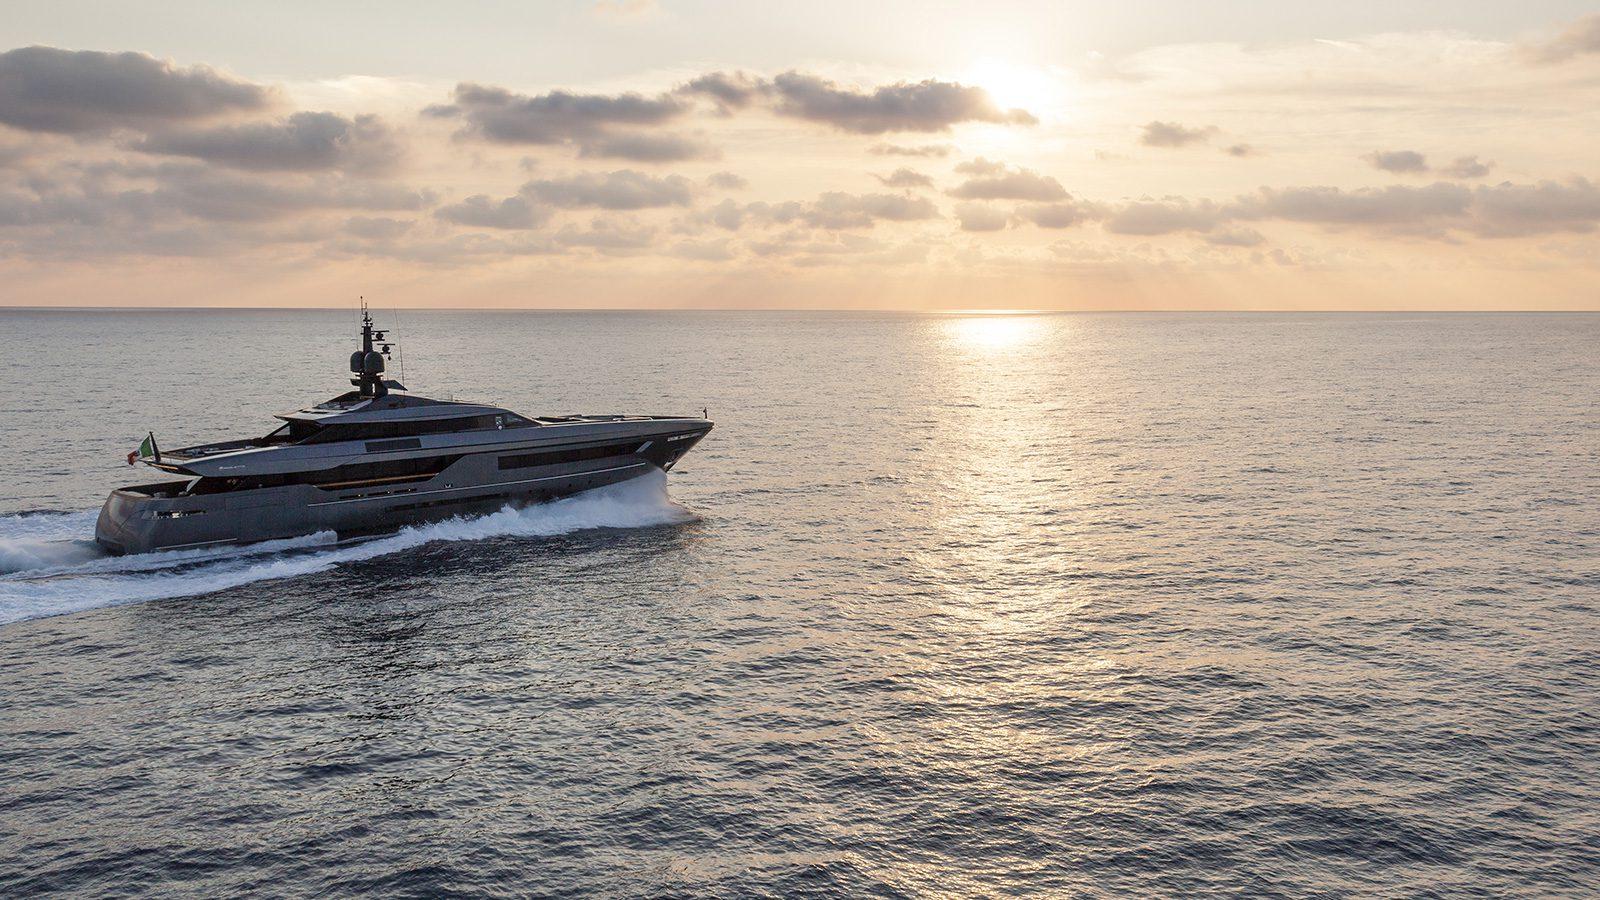 flotta-46mfast_esterno_02 | 46M Fast